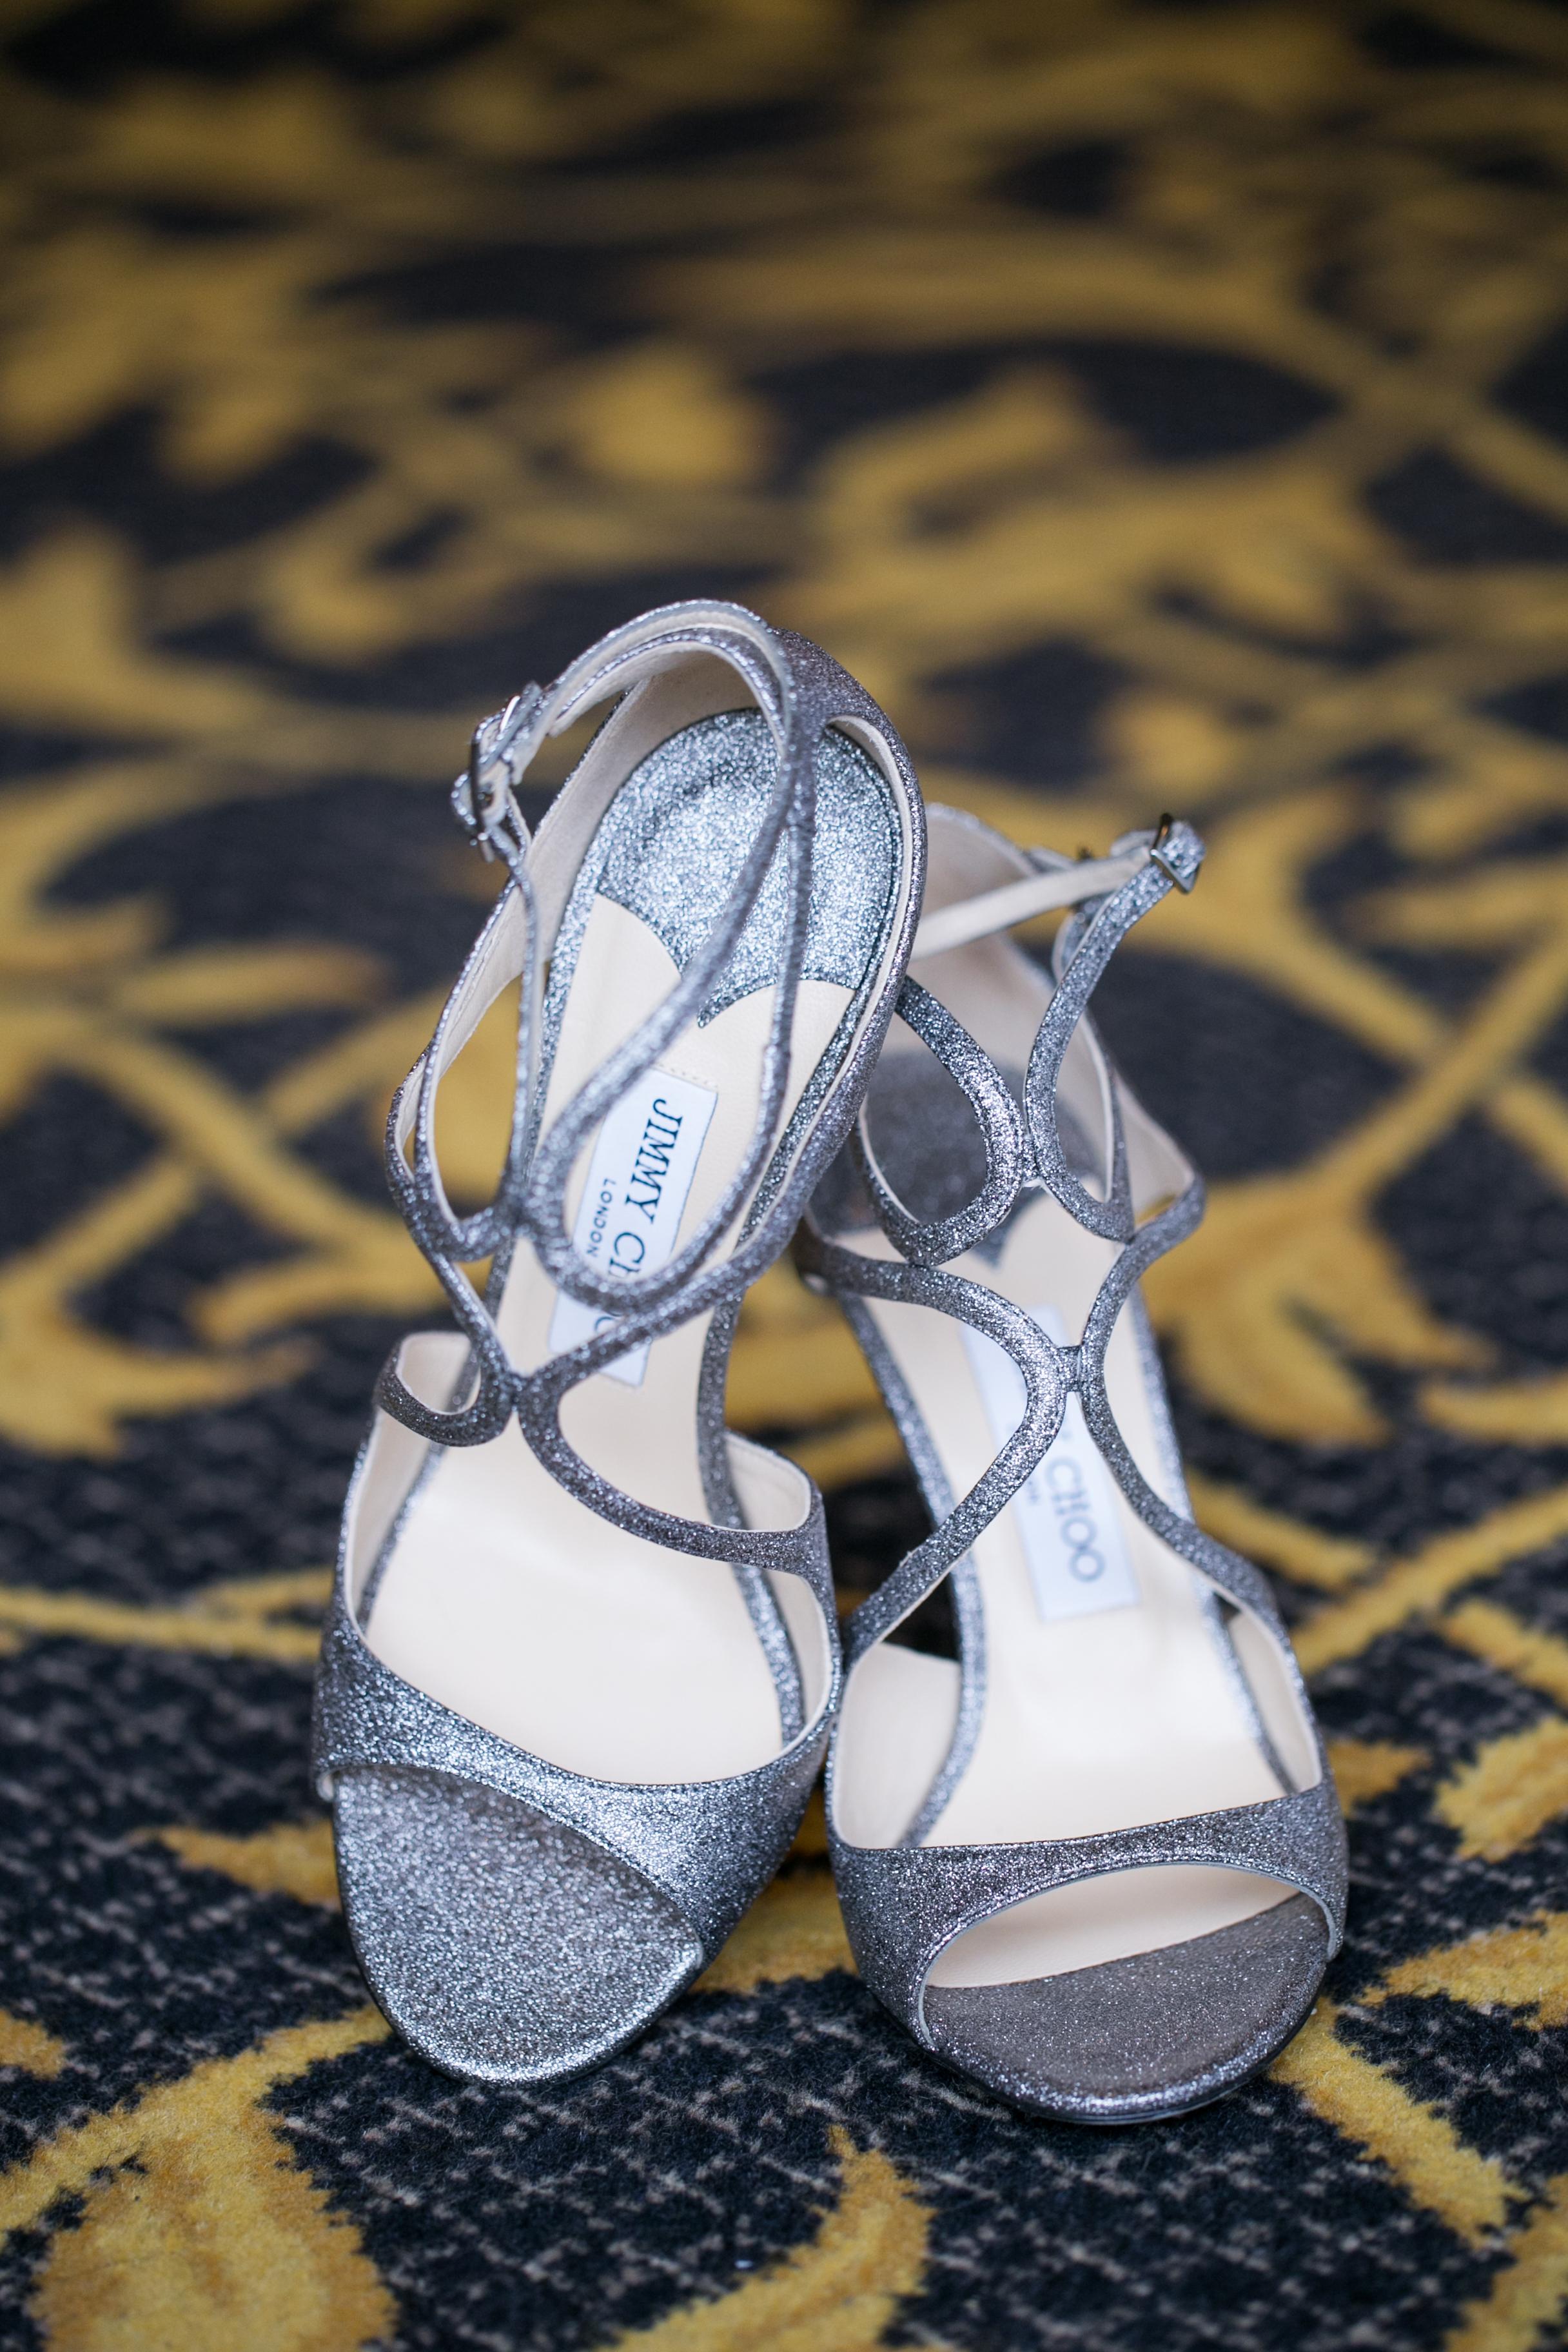 The Wedding of Kristina + David | Jewish Celebration - A Day To Remember